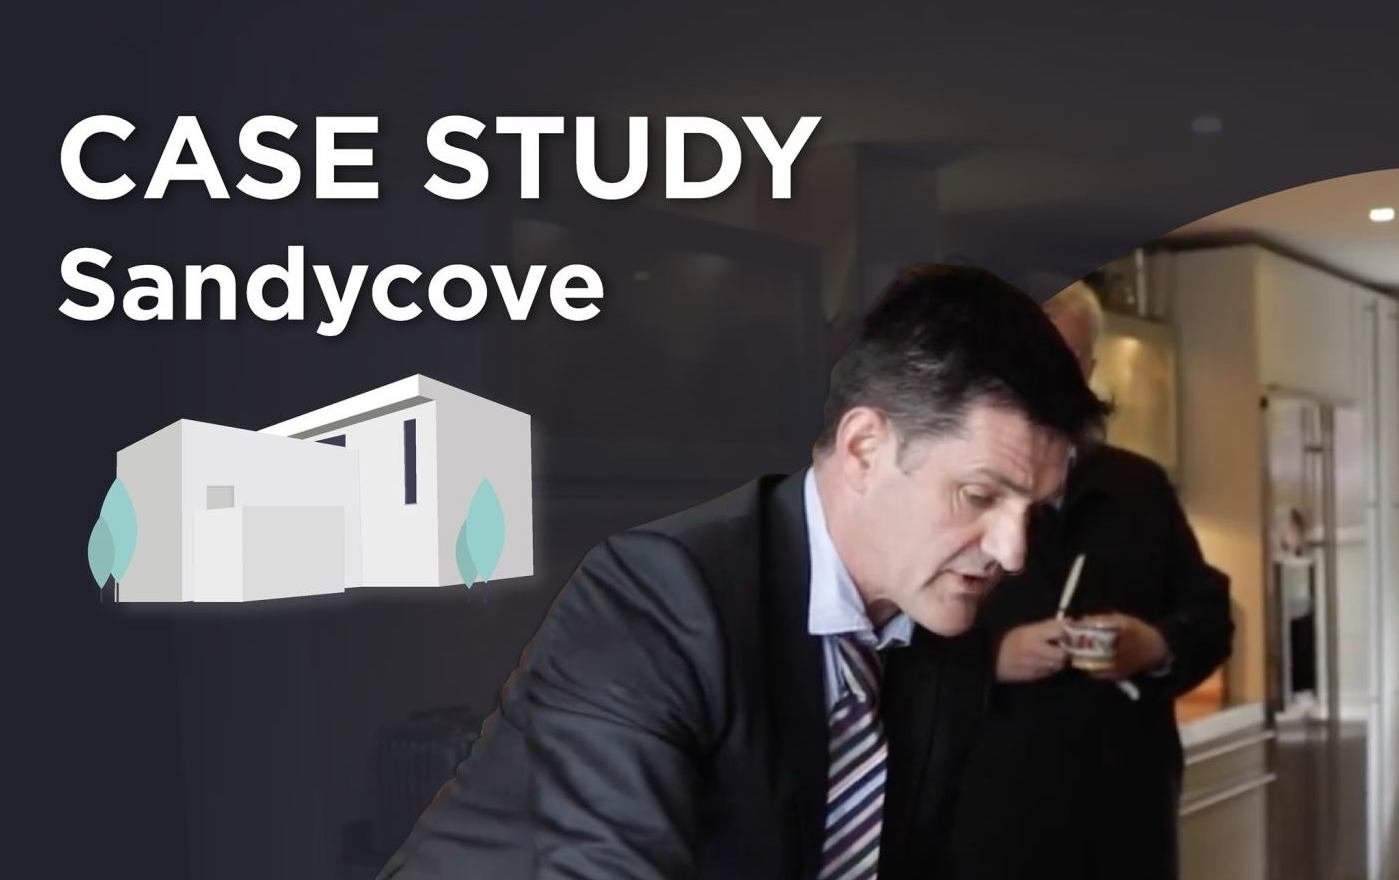 Sandycove Case Study